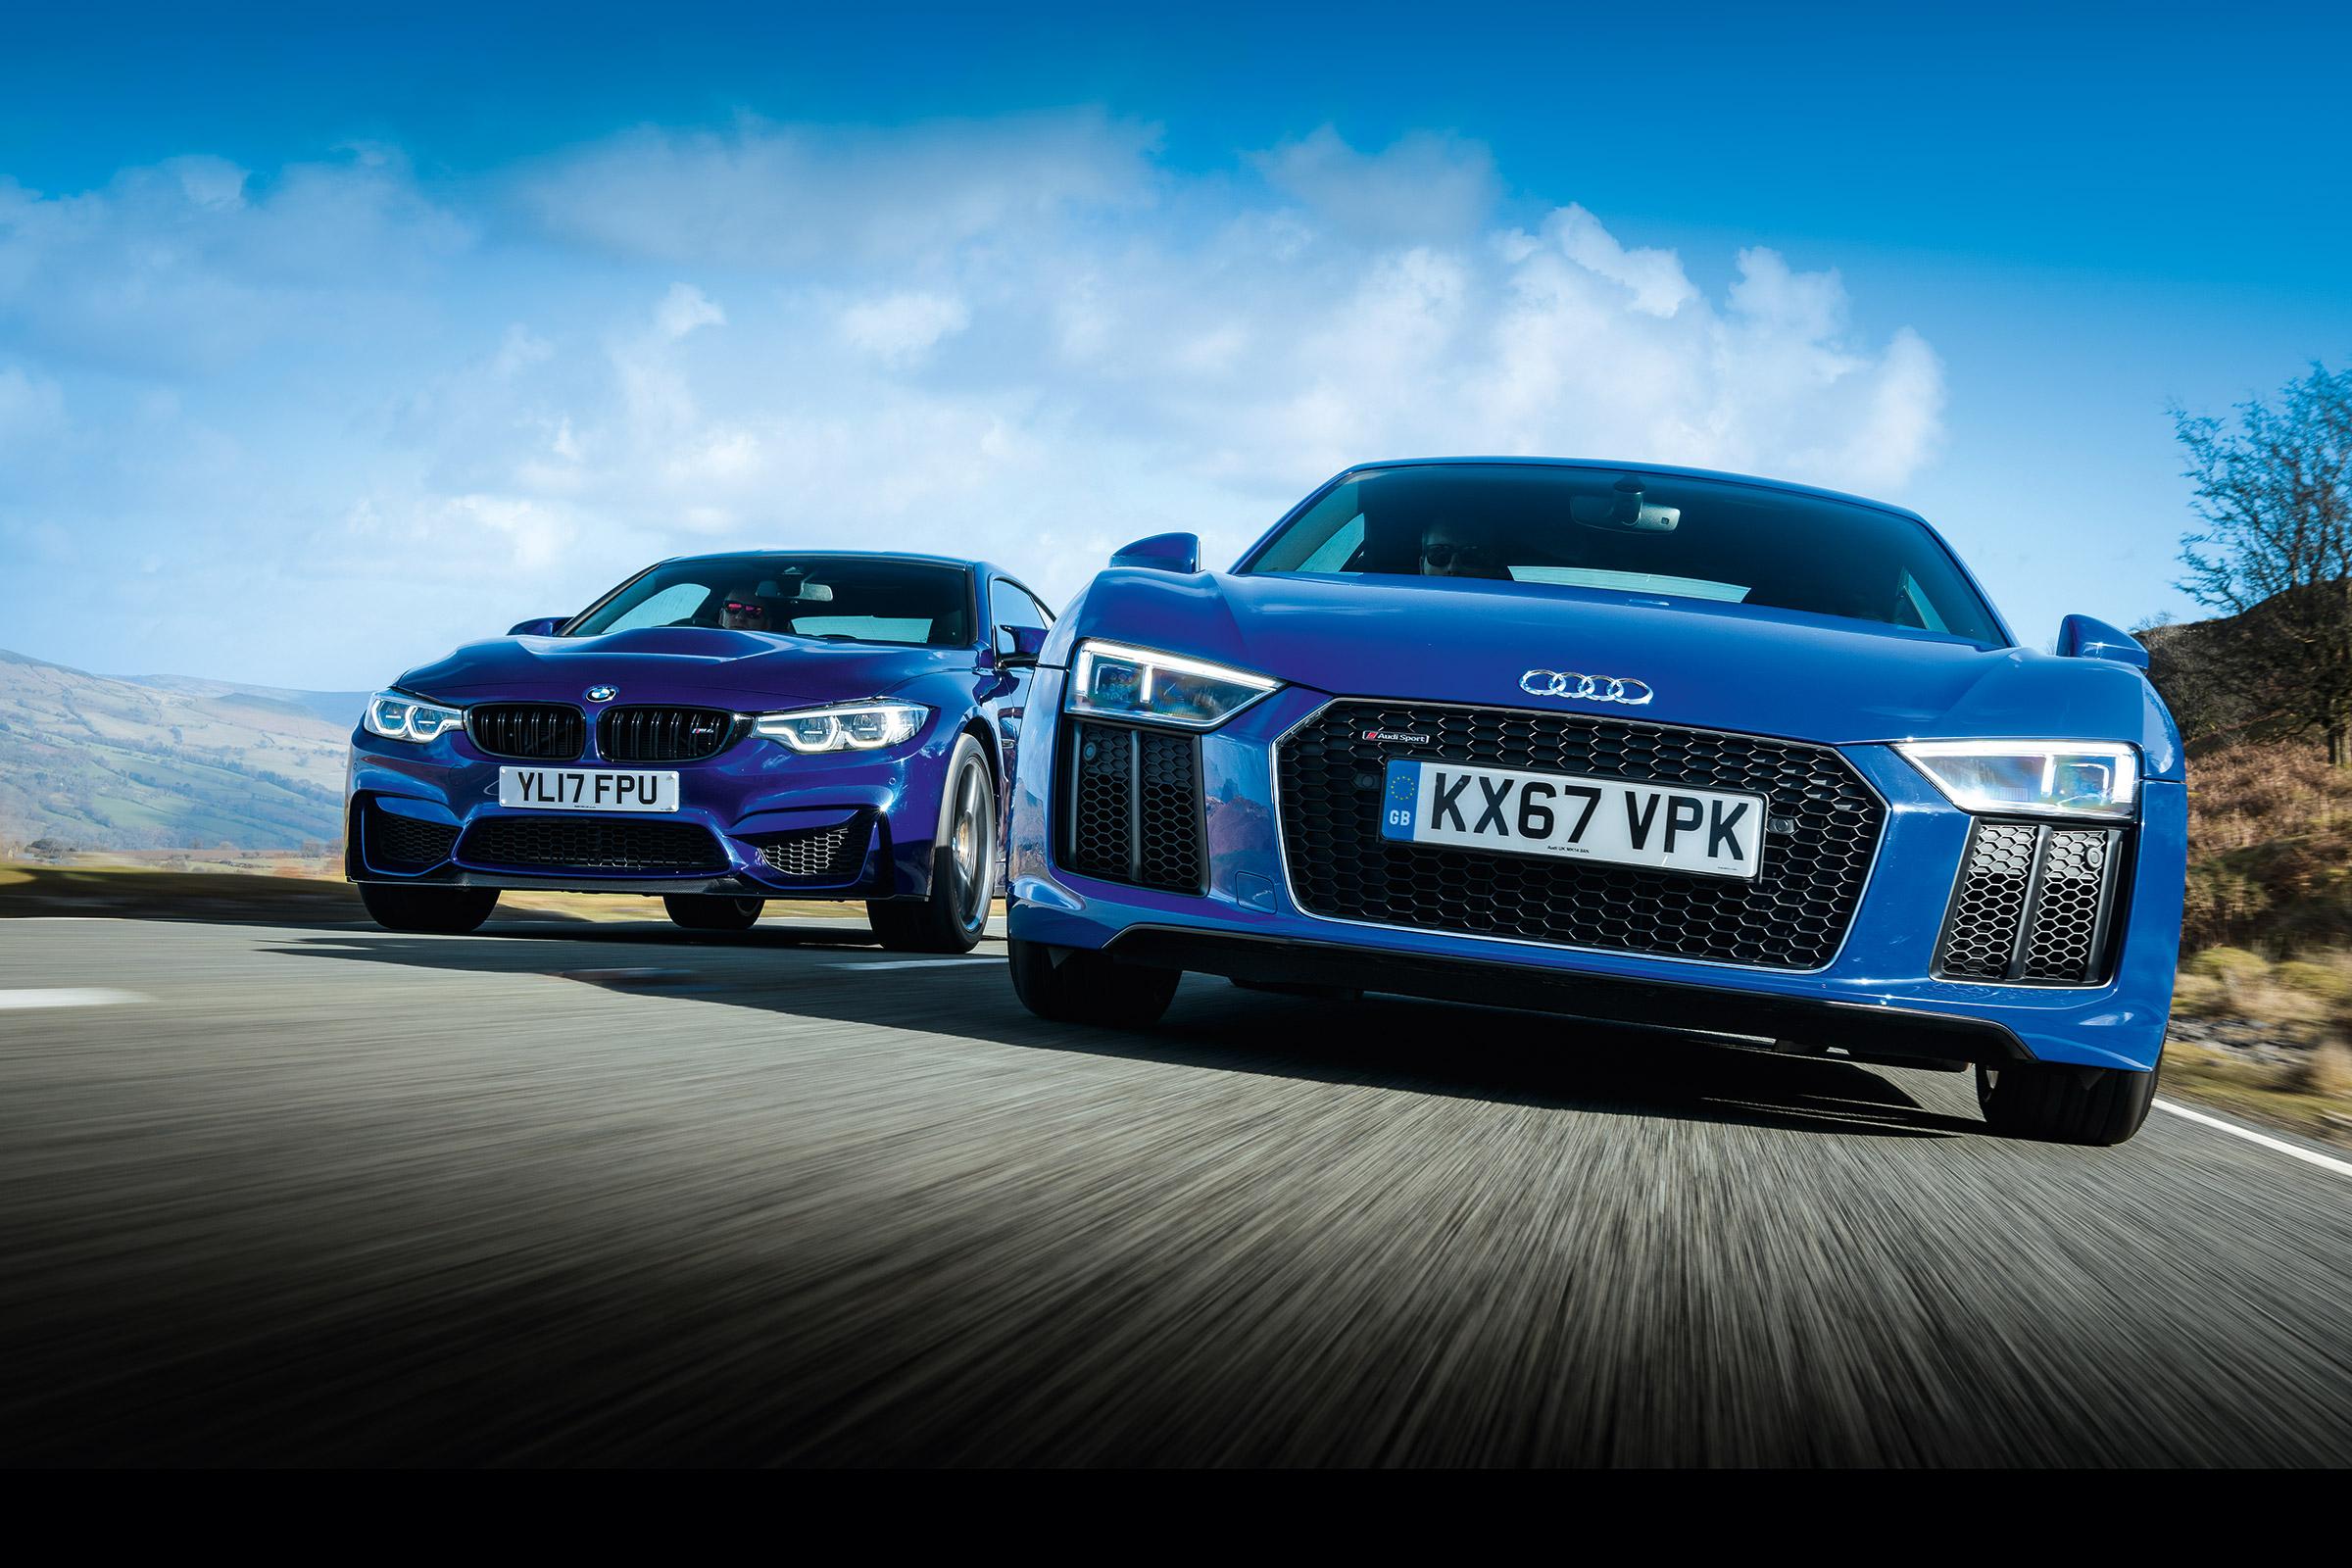 Kelebihan Audi Bmw Perbandingan Harga